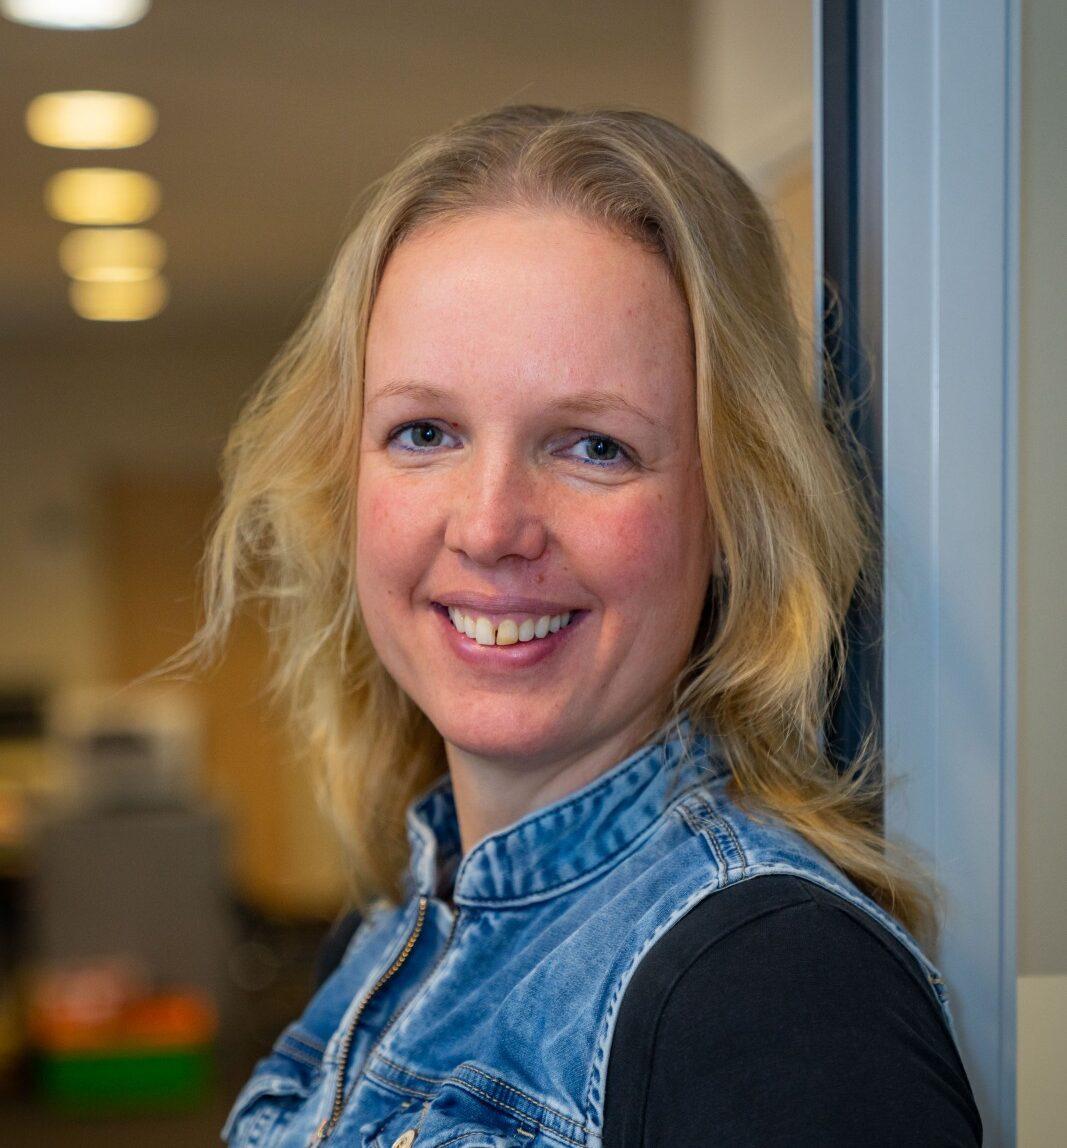 Marleen de Jong